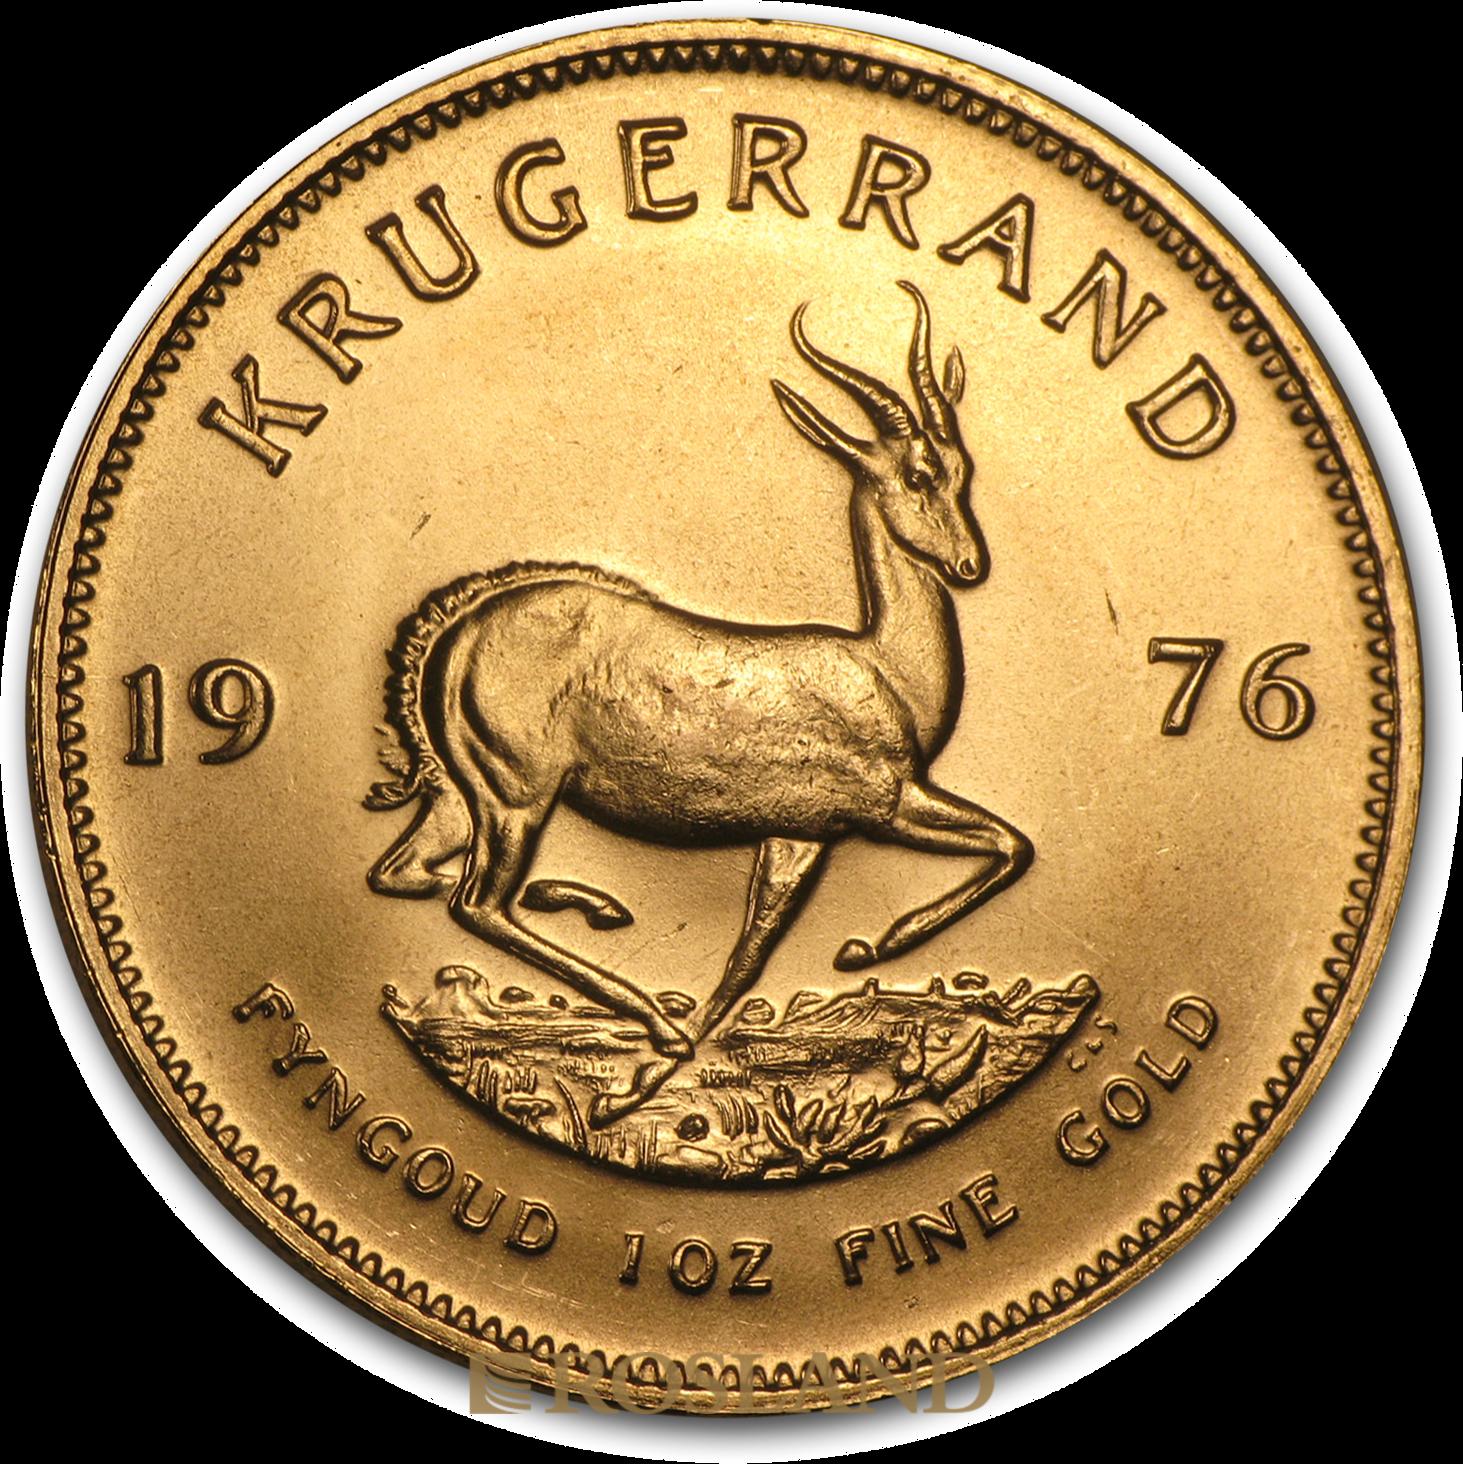 1 Unze Goldmünze Krügerrand 1976